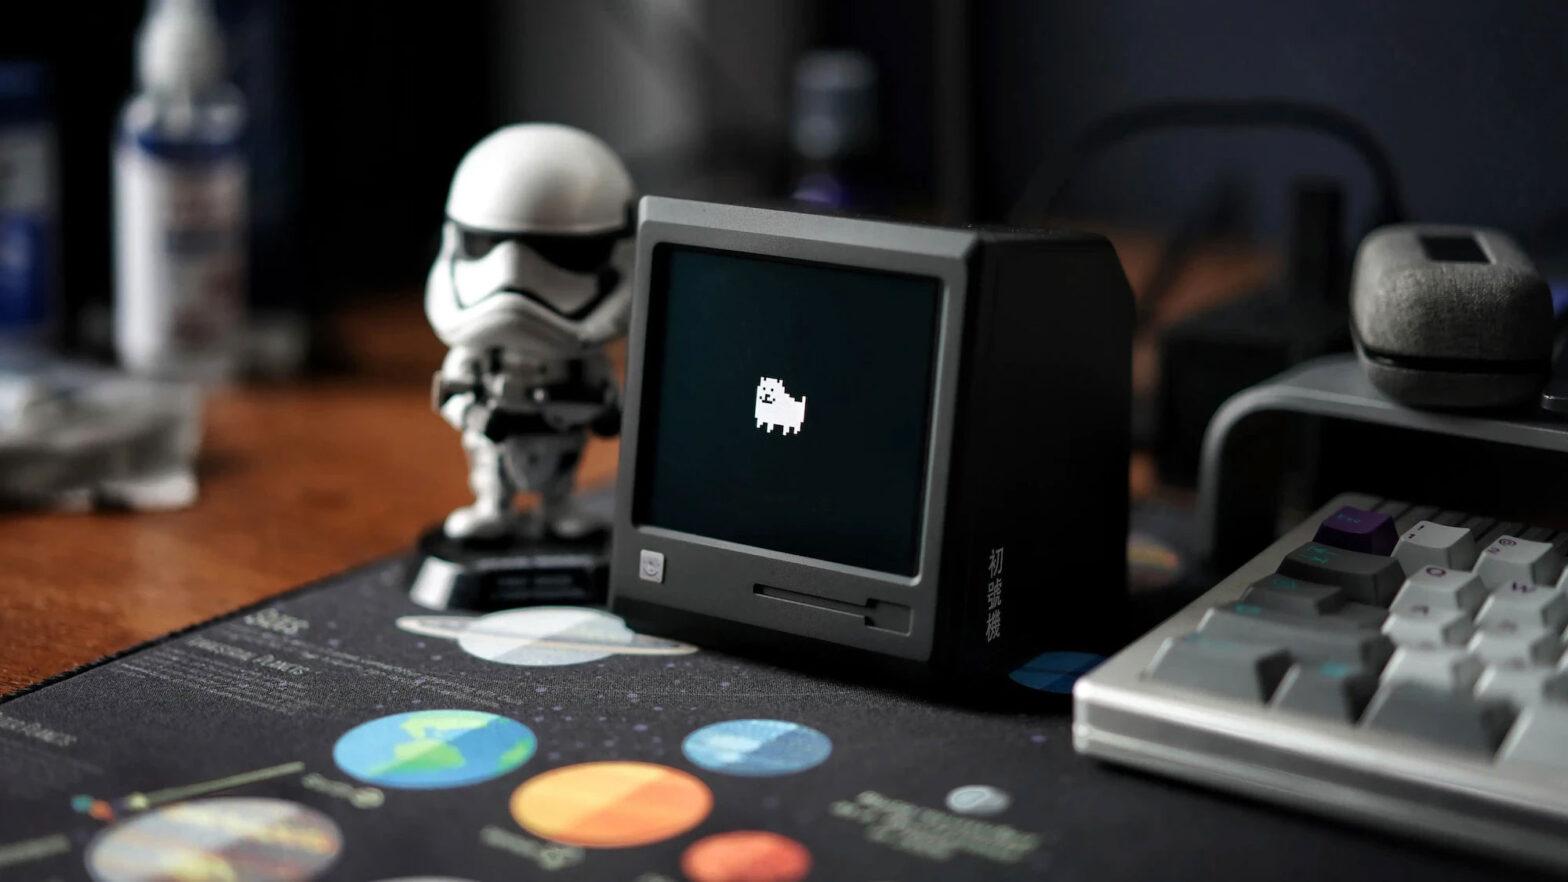 Cary Works ViewEdge R2 1984 Mini Macintosh